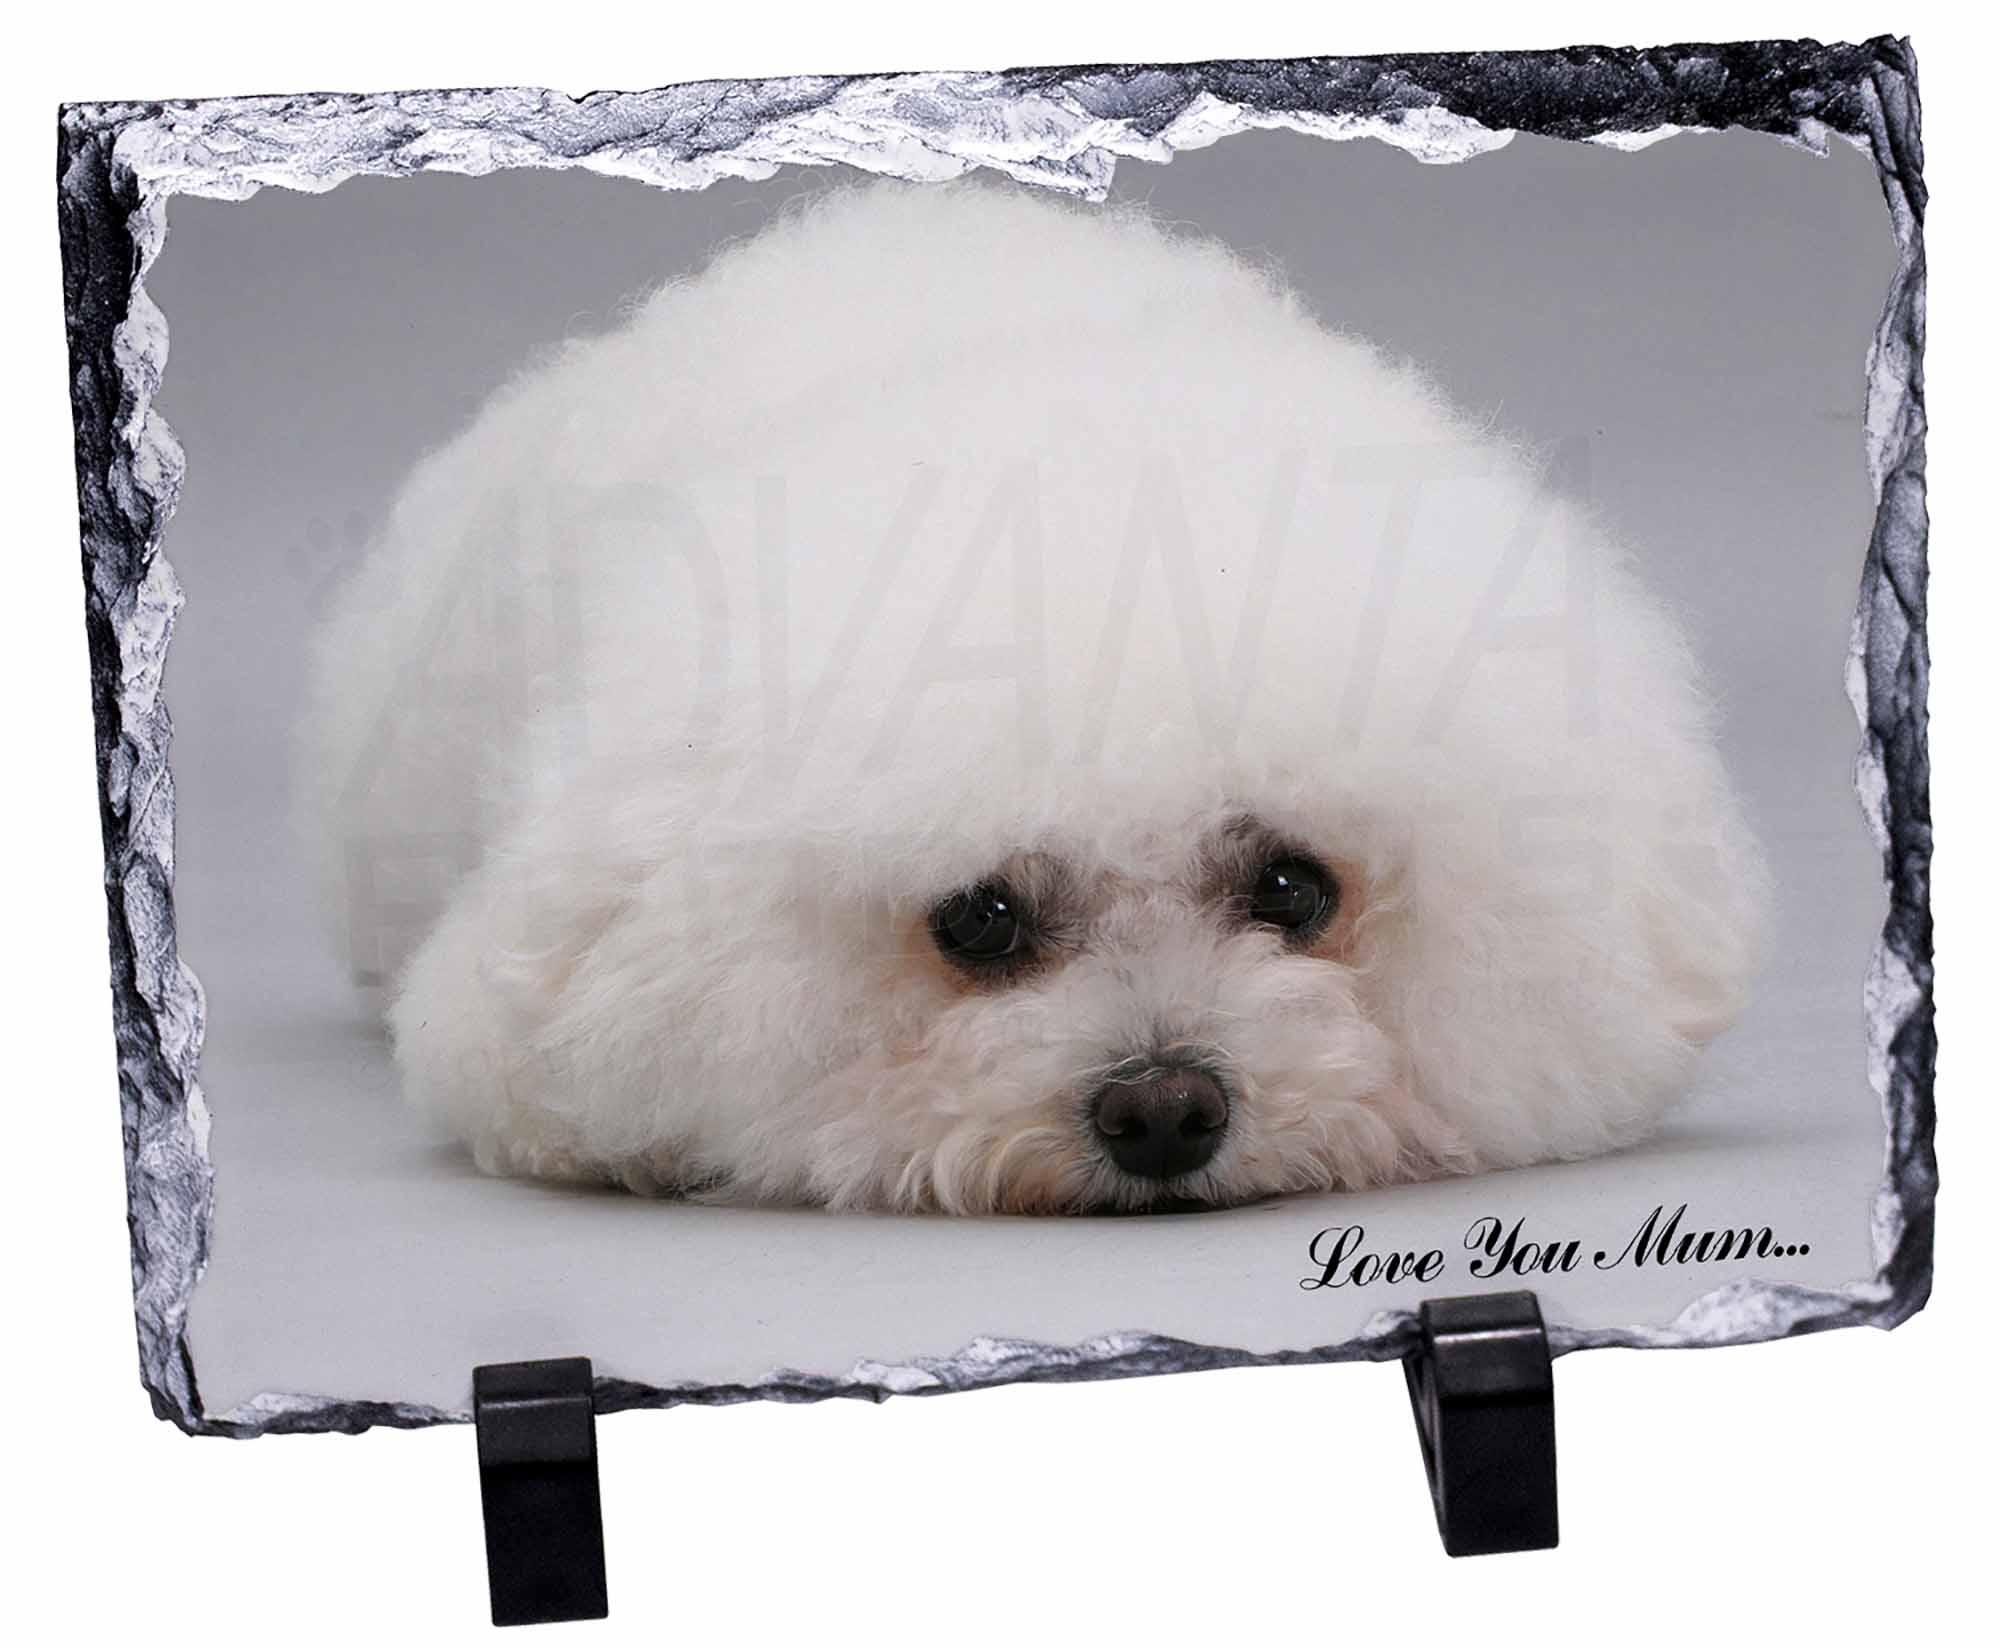 MUM-D2SL Bichon Frise Dog /'Love You Mum/' Photo Slate Christmas Gift Ornament